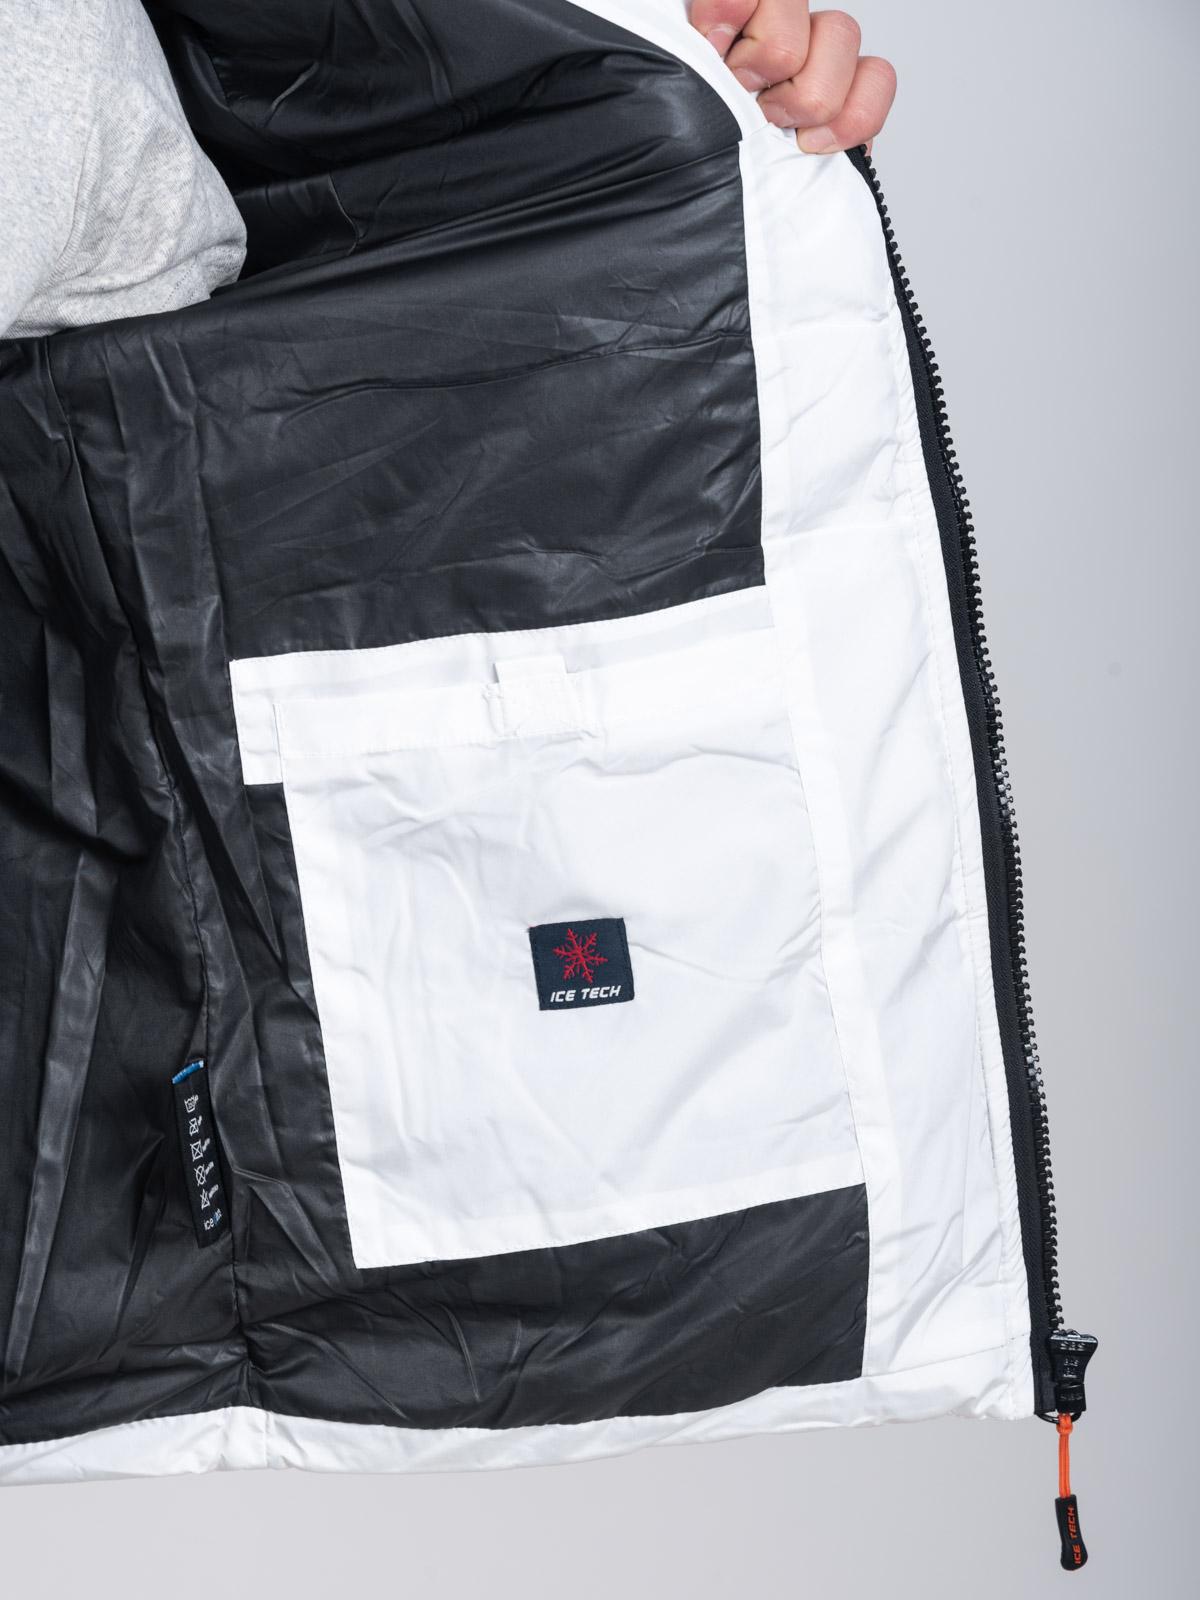 ICETECH G837 WHITE-BLACK - ΑΝΡΙΚΟ ΤΖΑΚΕΤ ΛΕΥΚΟ-ΜΑΥΡΟ